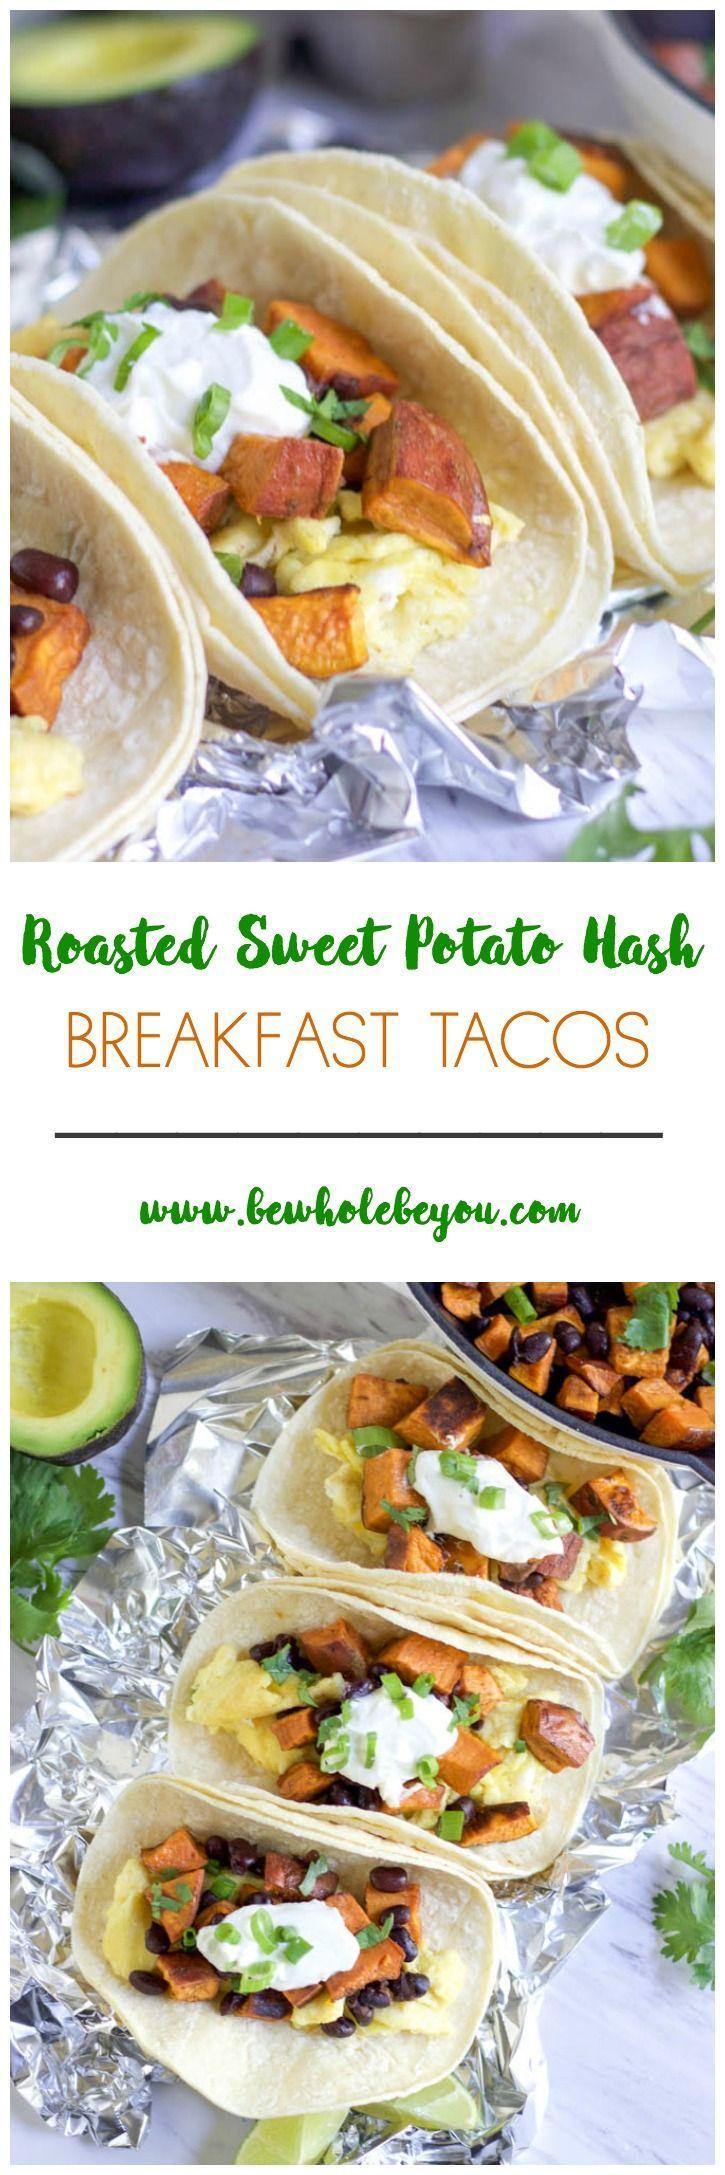 Roasted Sweet Potato Hash Breakfast Tacos